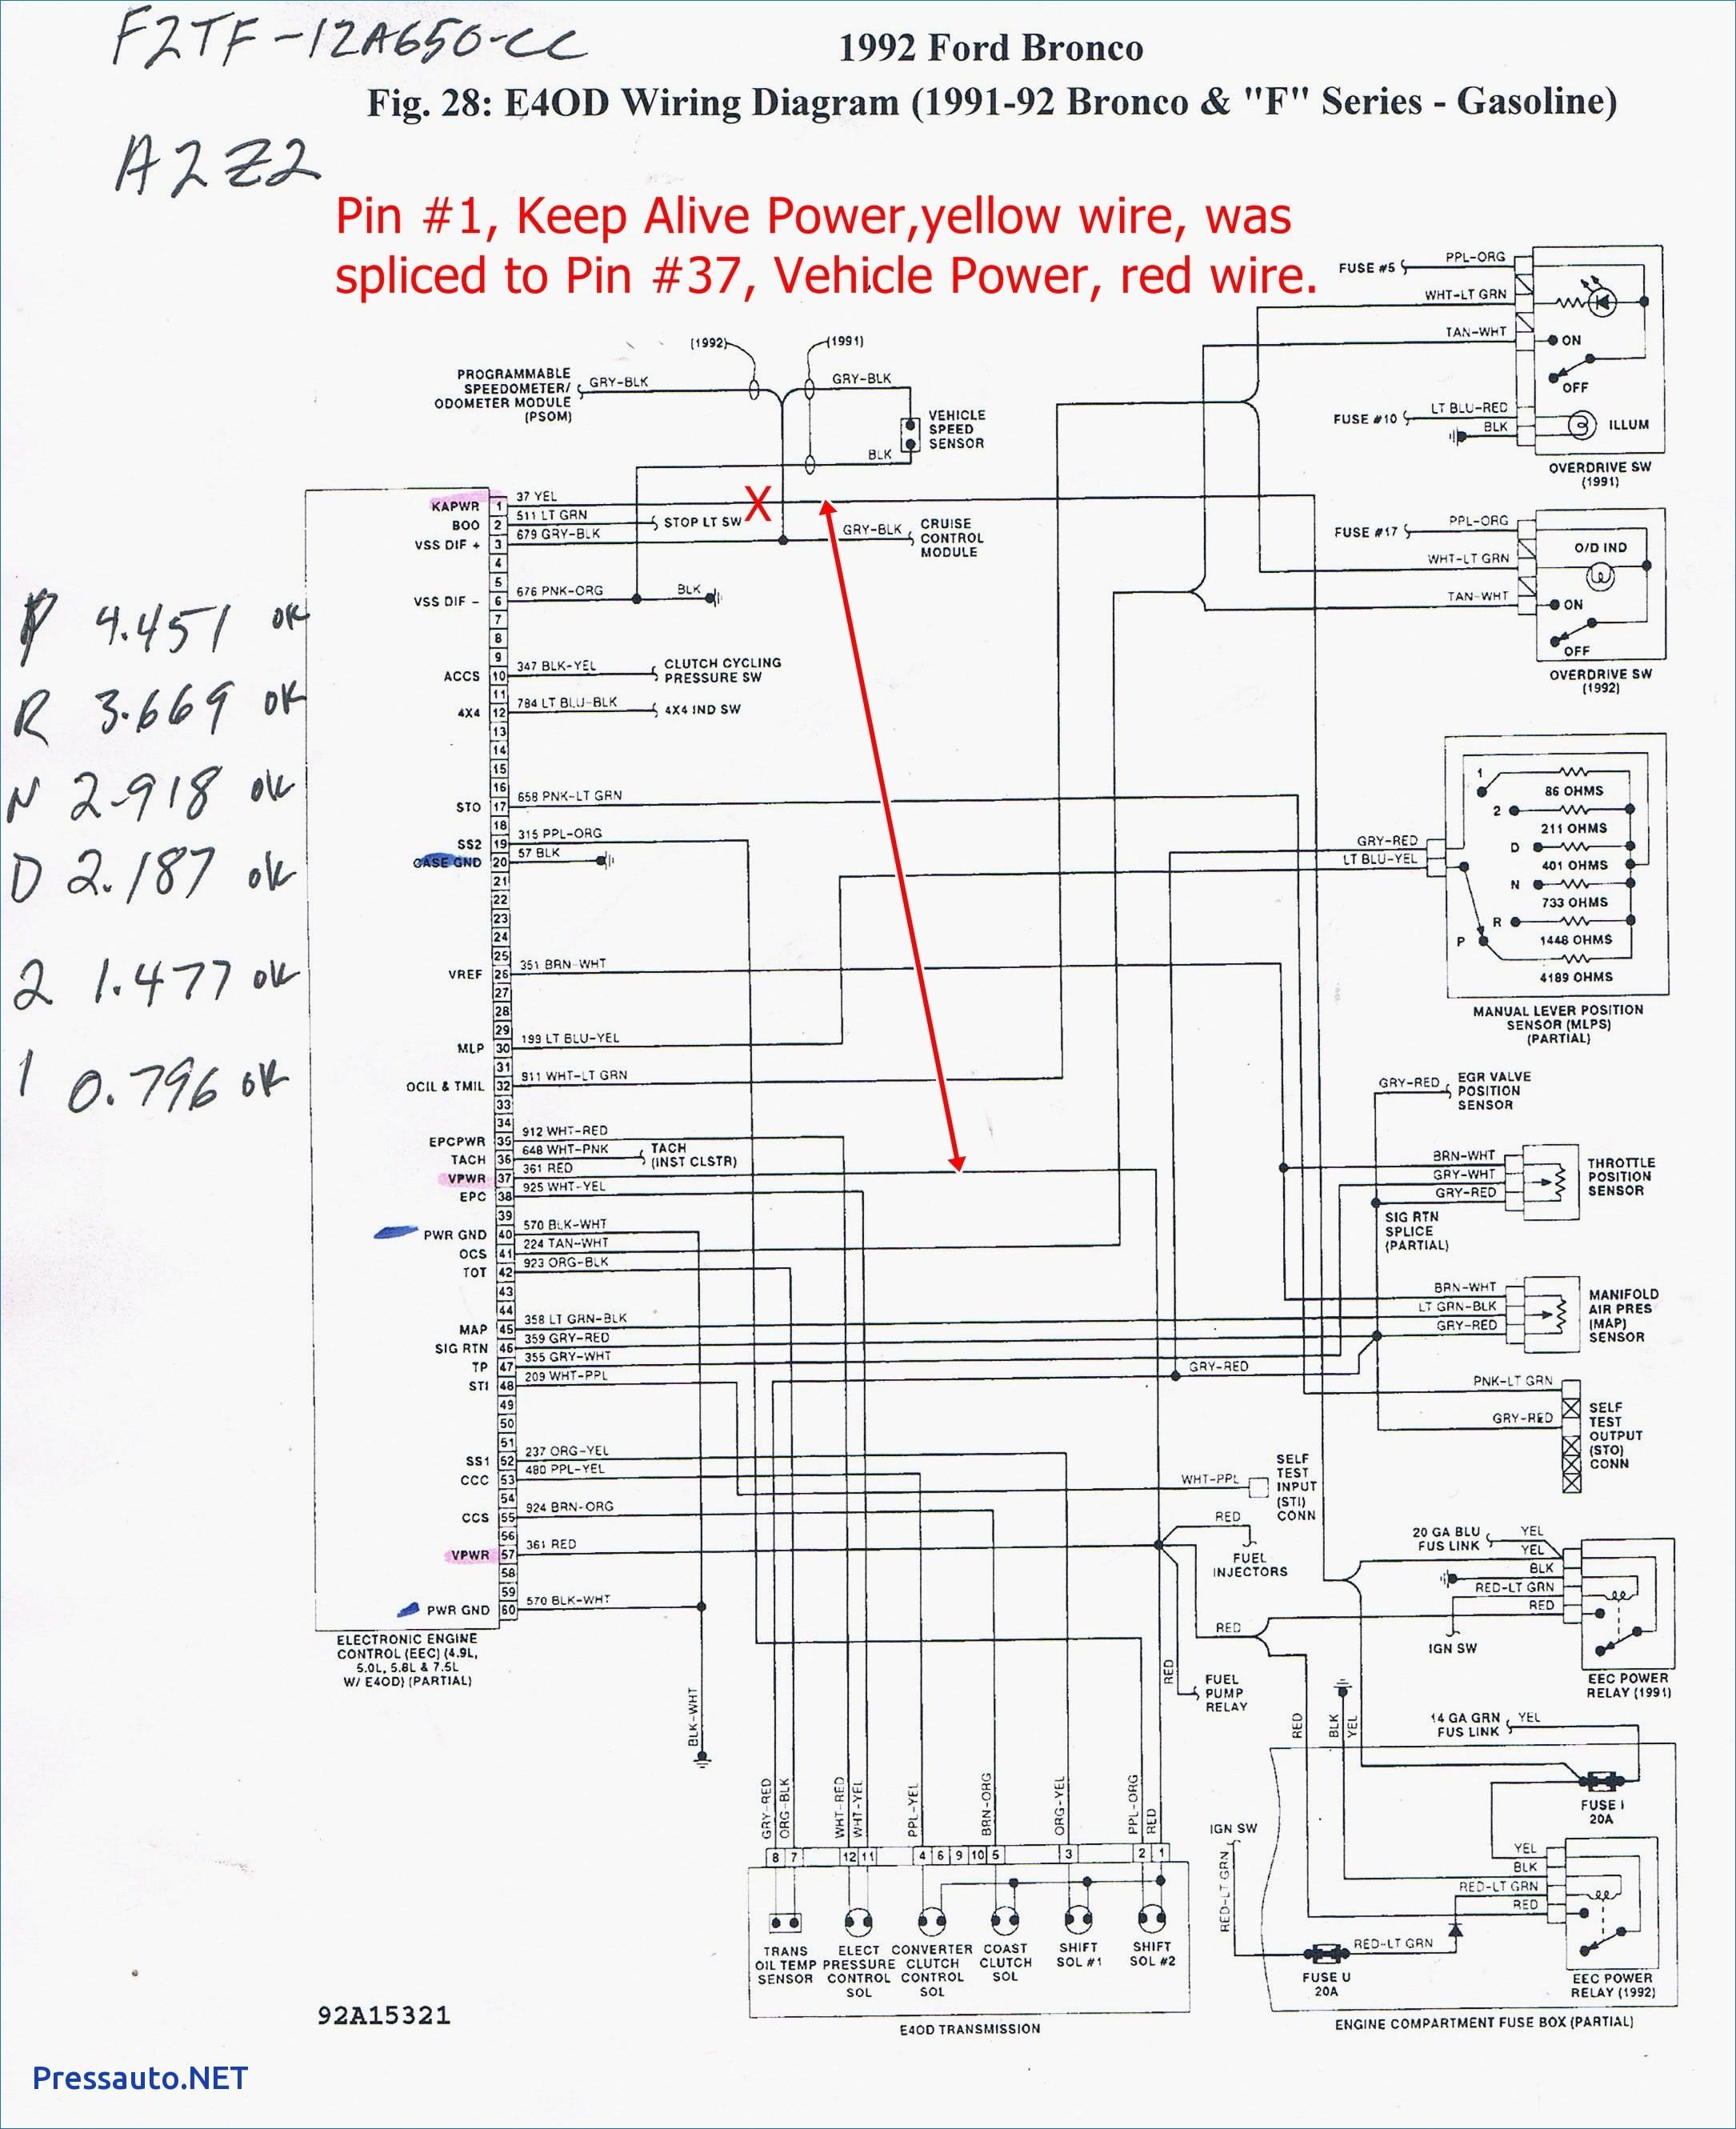 Ford Explorer Engine Diagram ford Explorering Diagram for Range Need Harness Ranger 4×4 Of Ford Explorer Engine Diagram